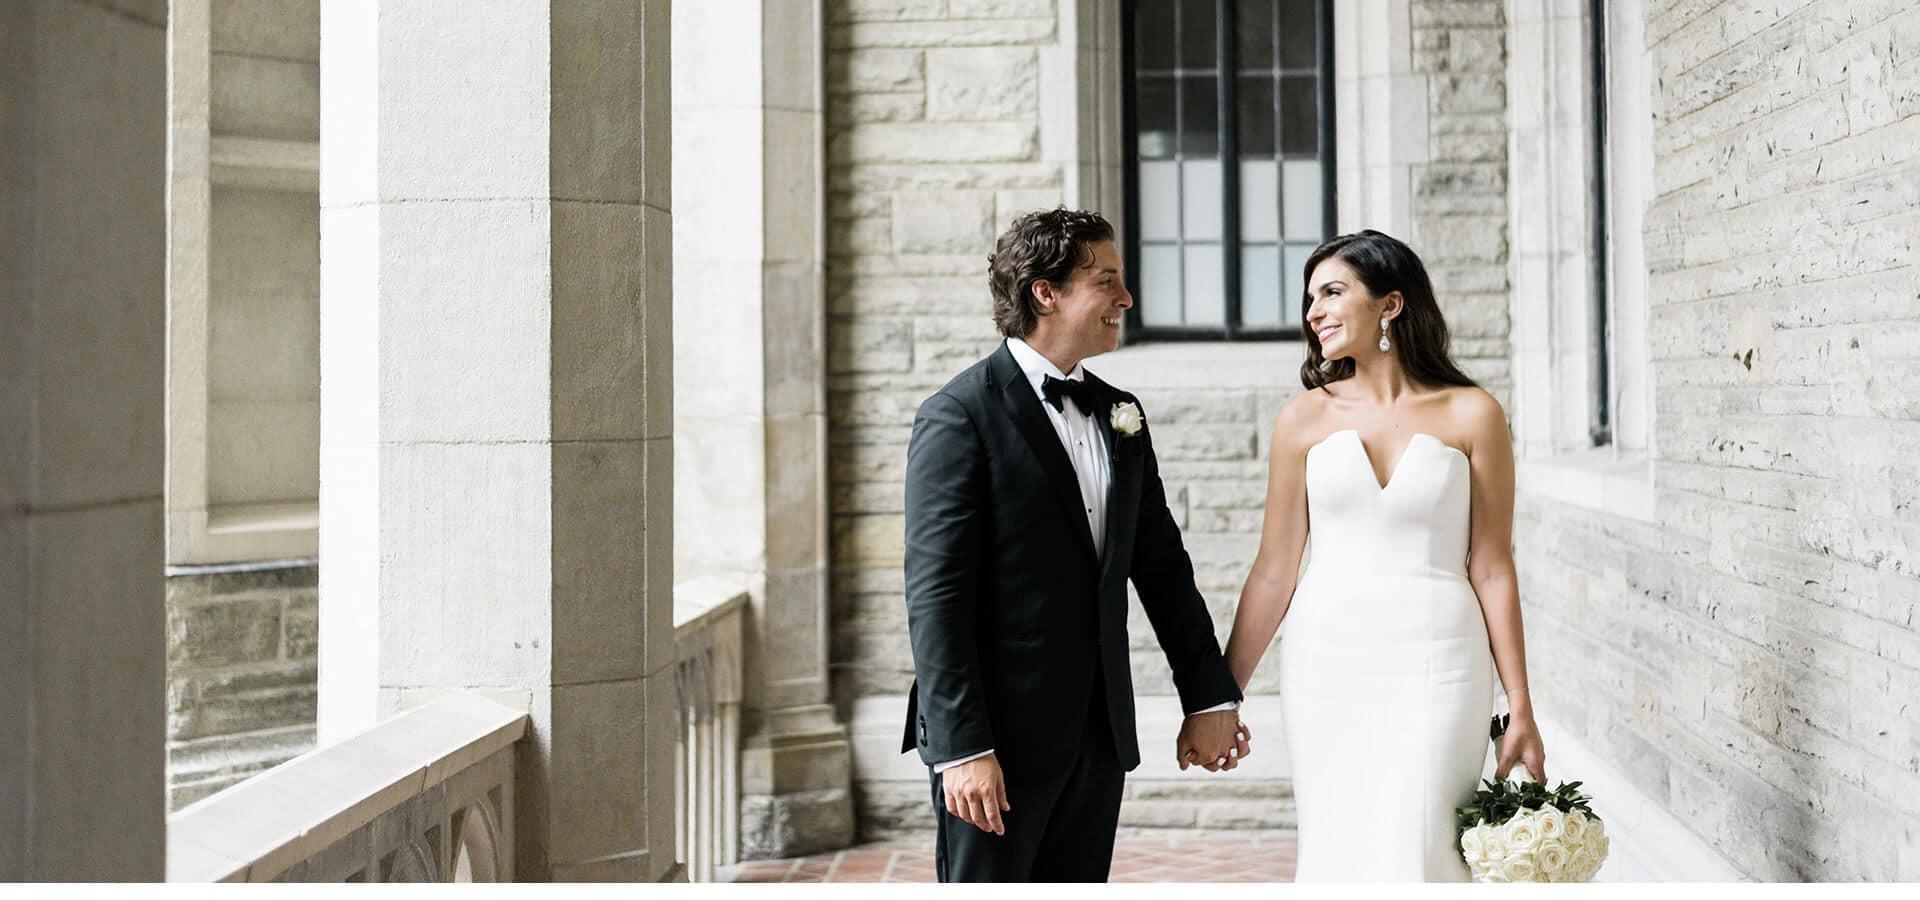 Hero image for Samantha and Adam's Dream Wedding at Casa Loma